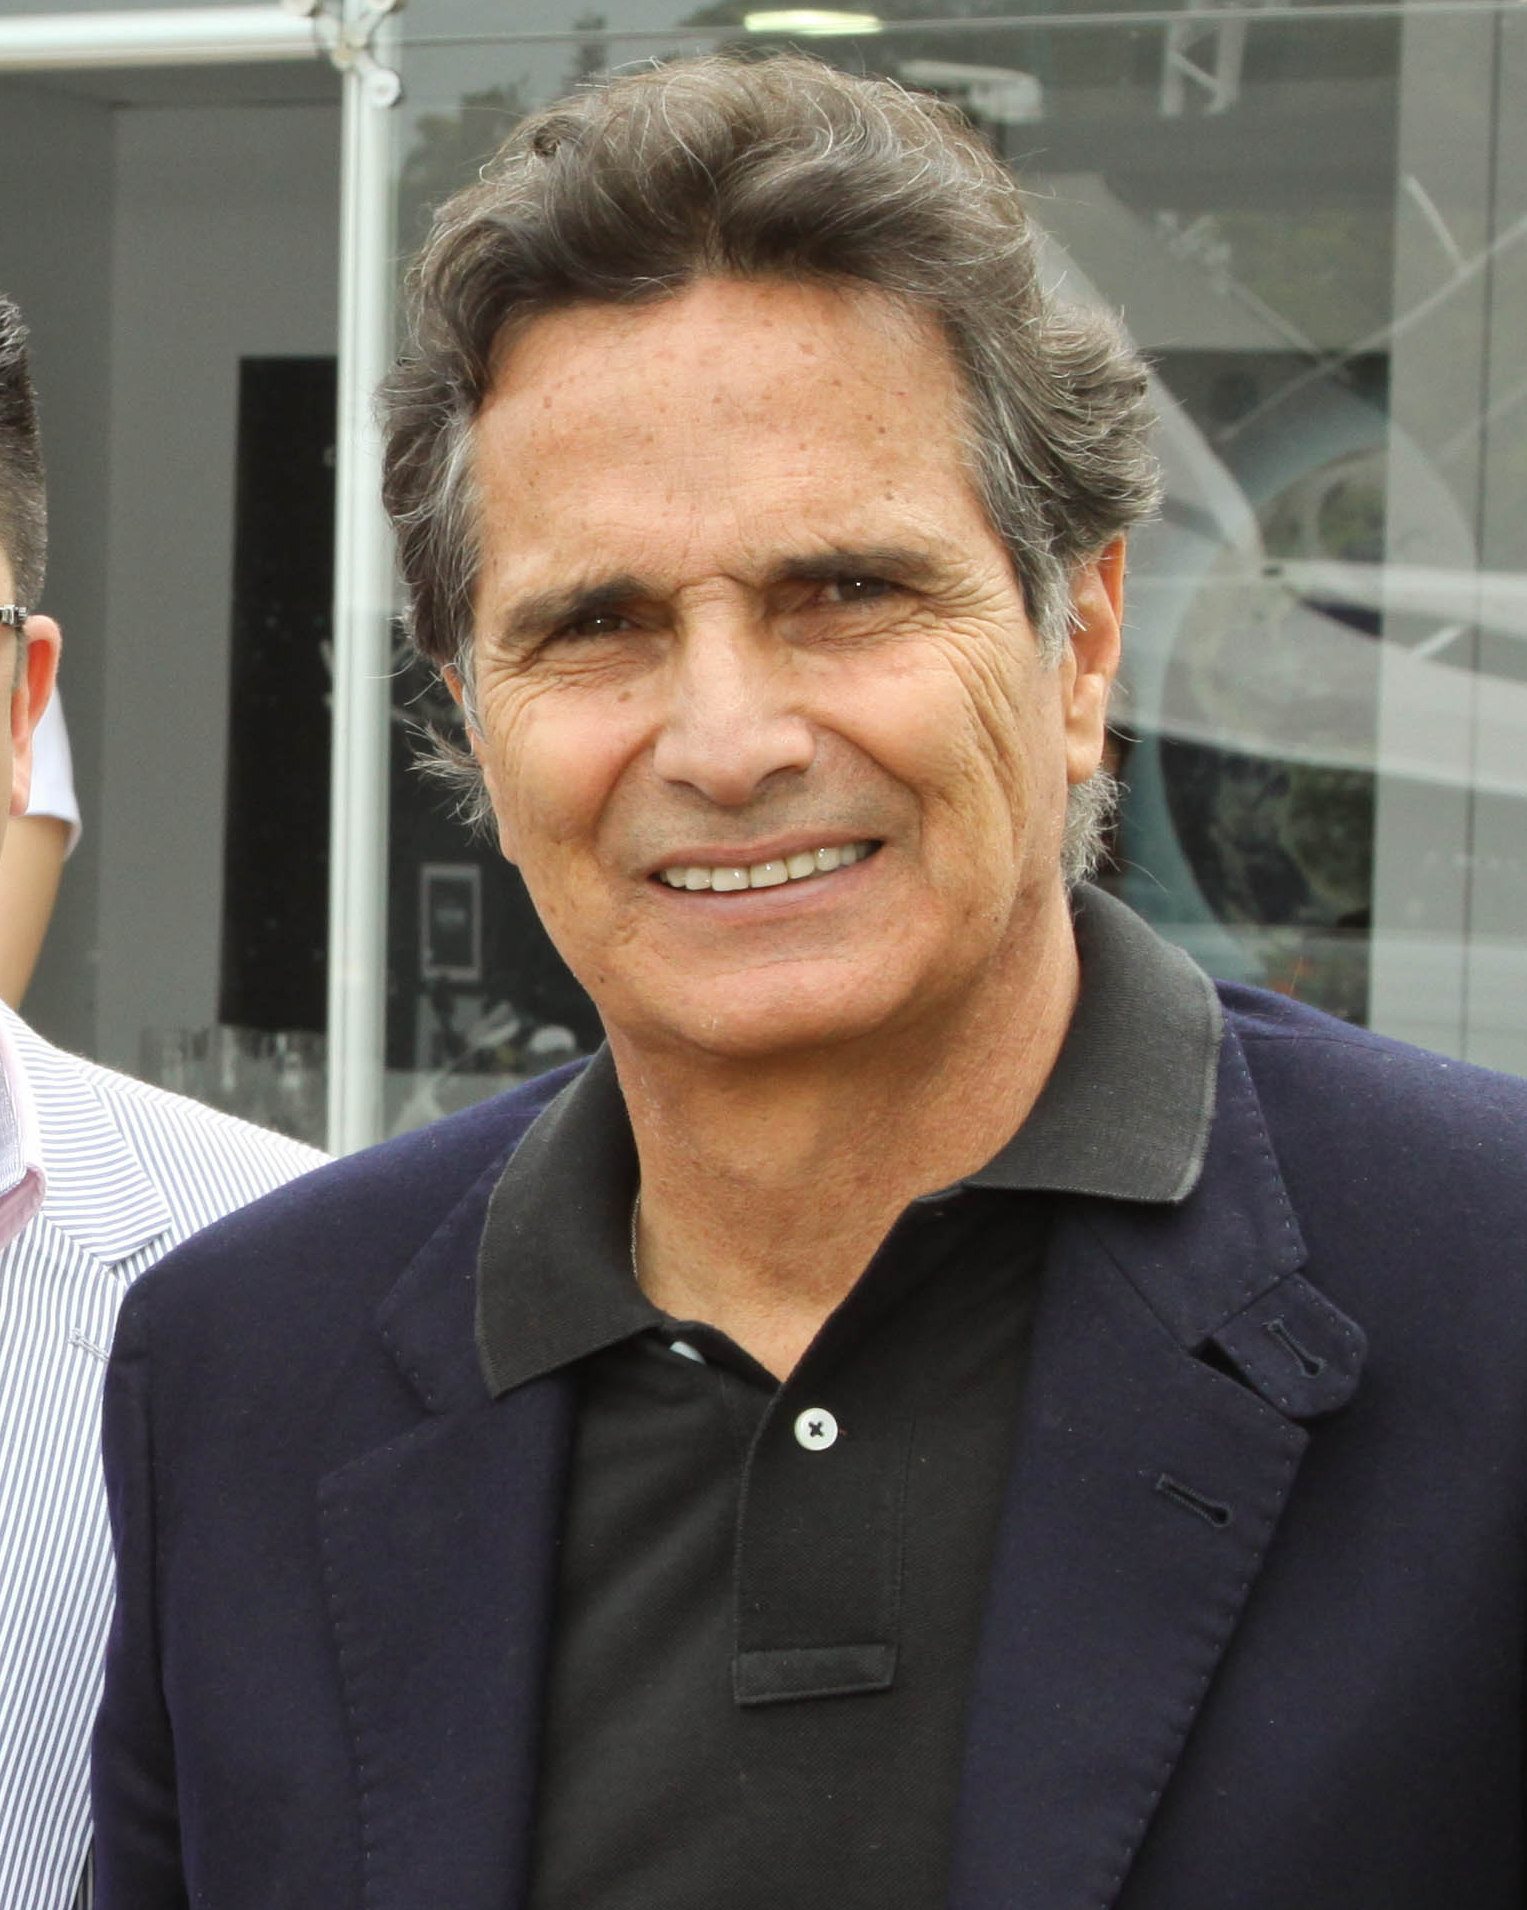 Nelson Piquet Souto Maior Net Worth